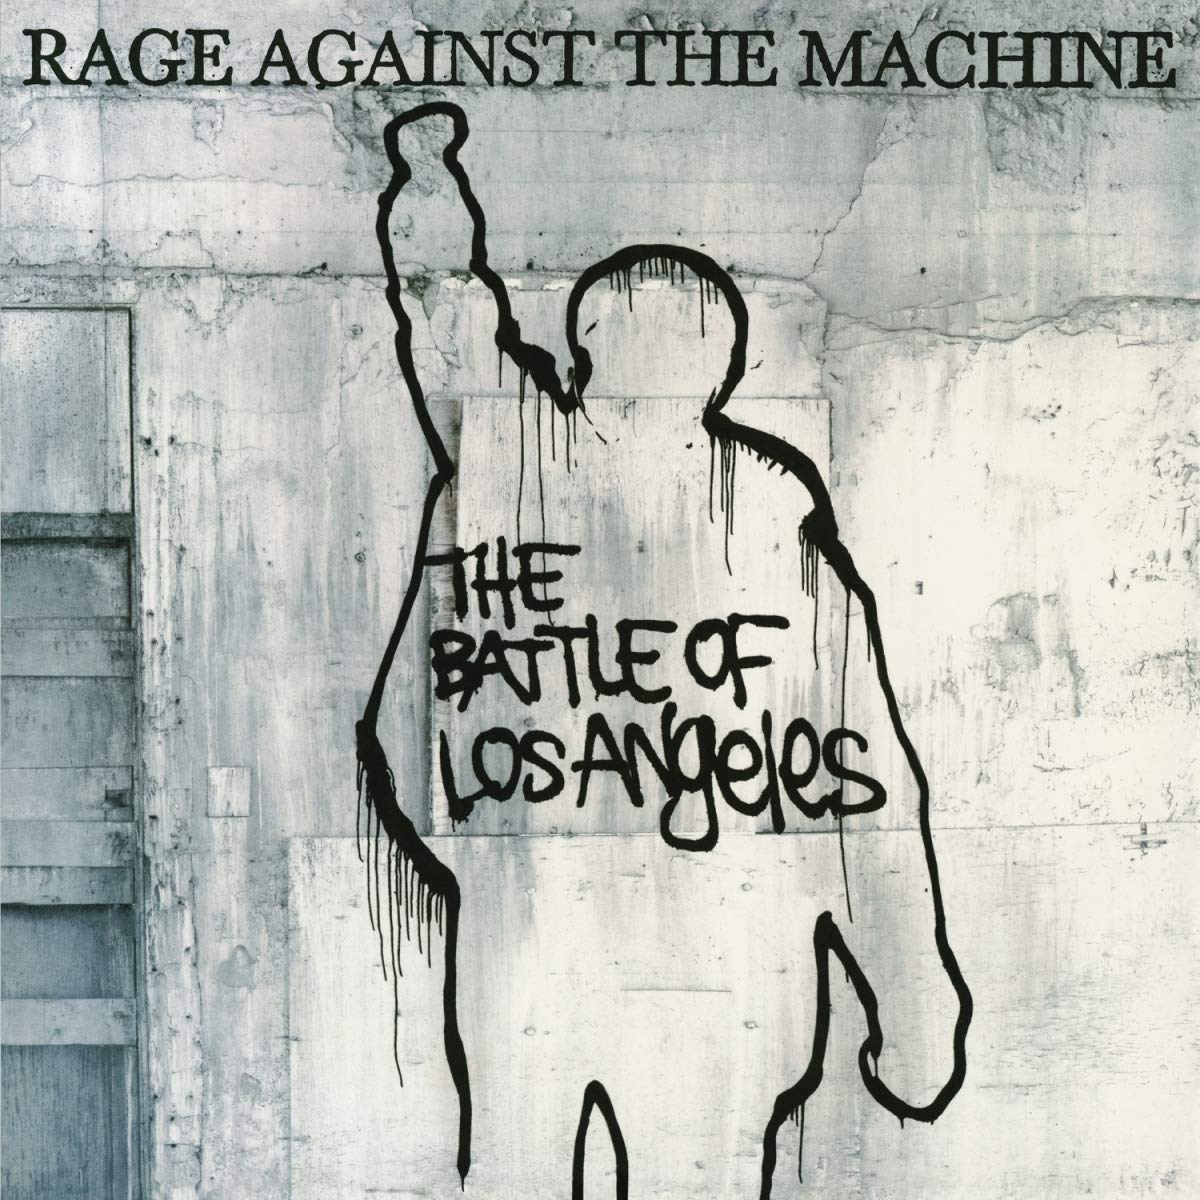 Vinilo : Rage Against the Machine - The Battle Of Los Angeles (180 Gram Vinyl)